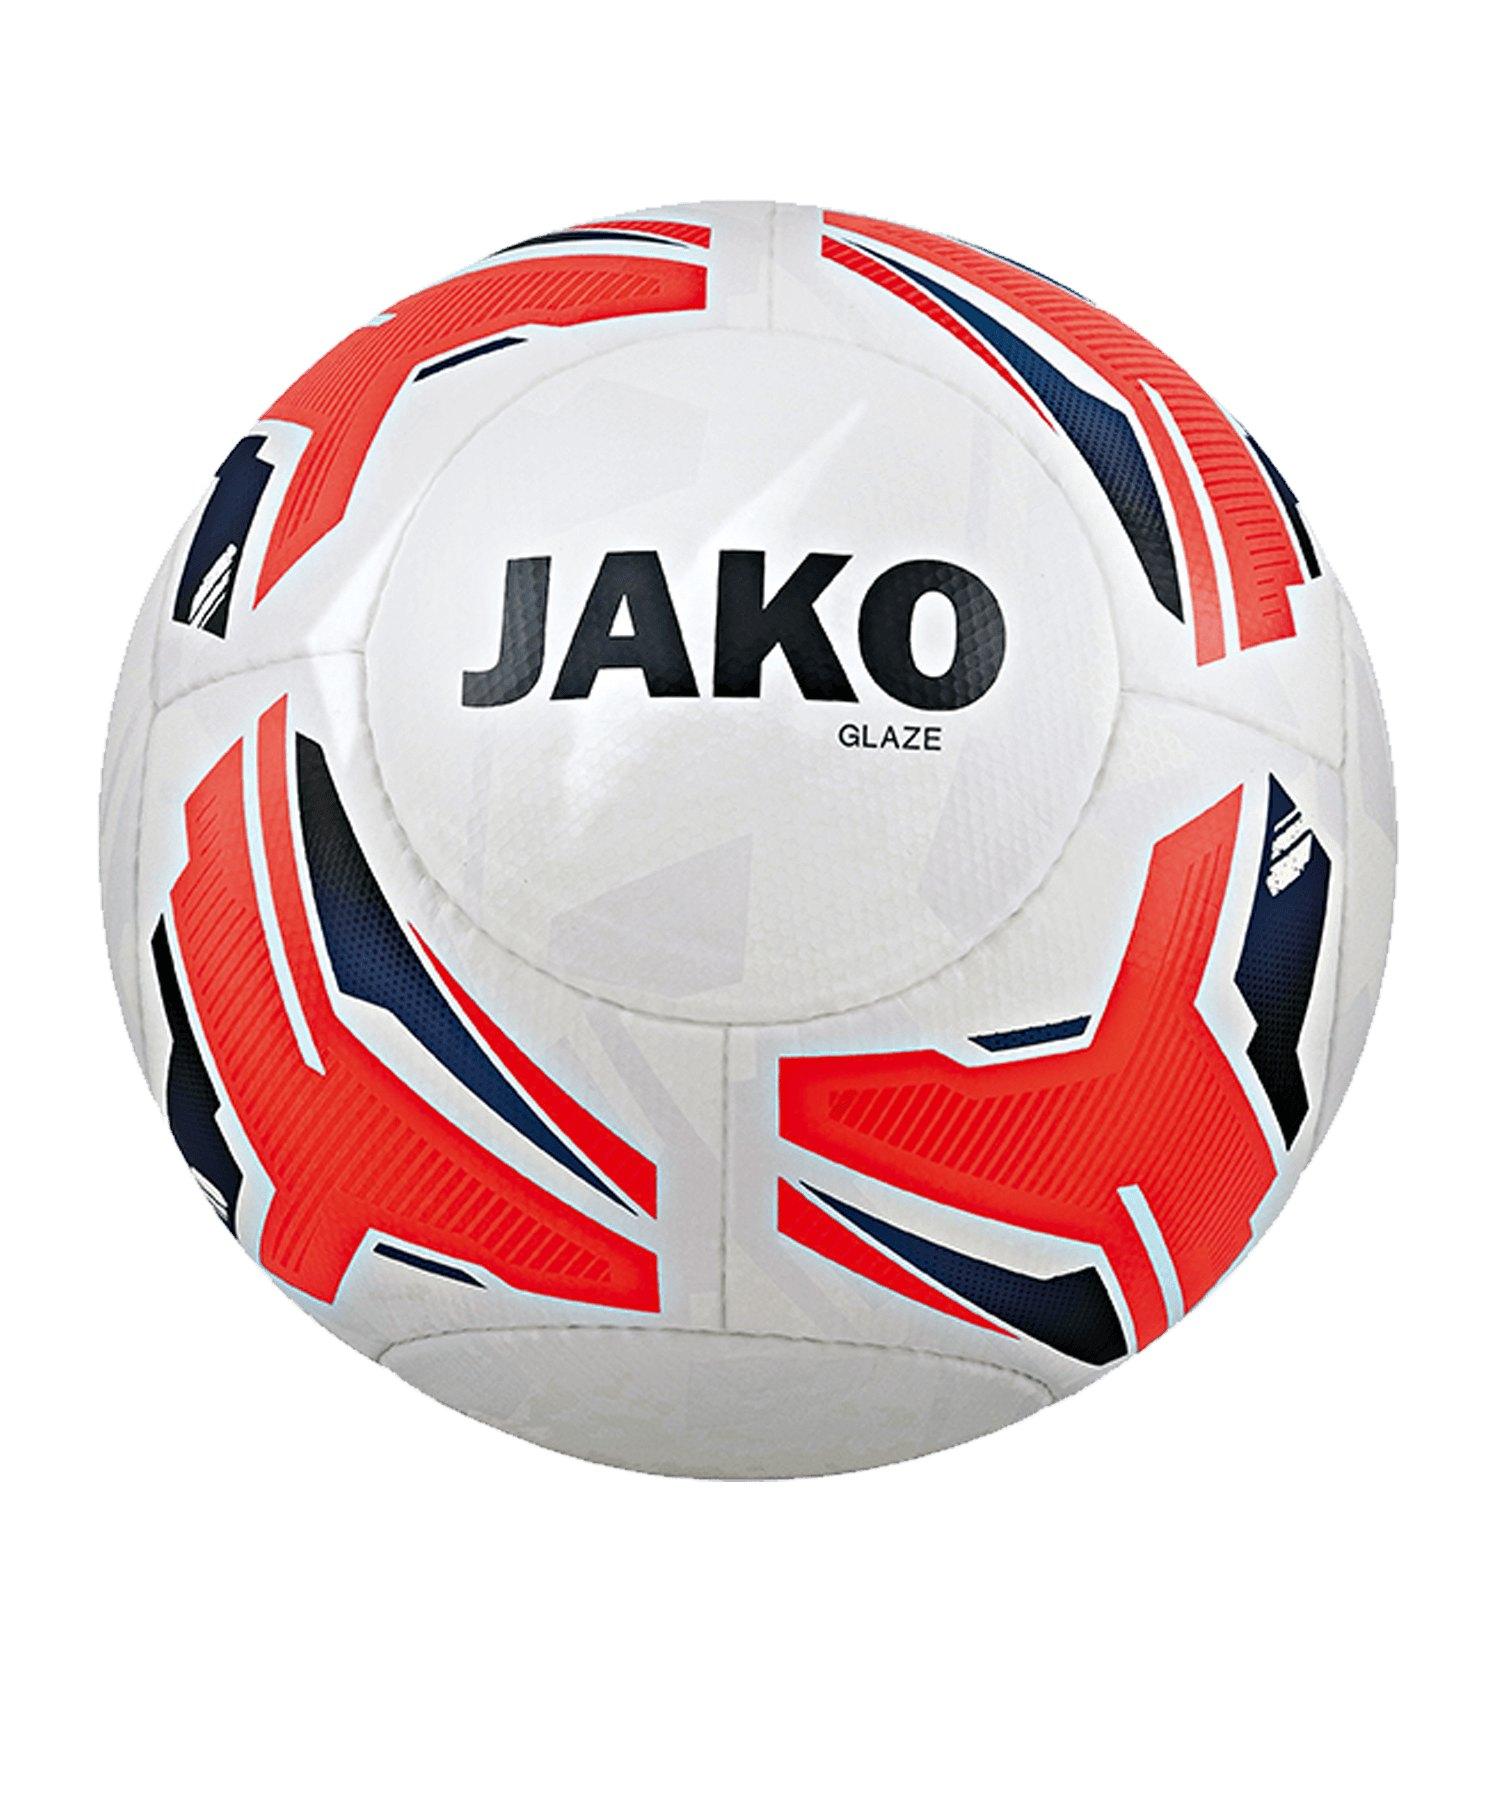 JAKO Glaze Trainingsball Weiss F00 - weiss